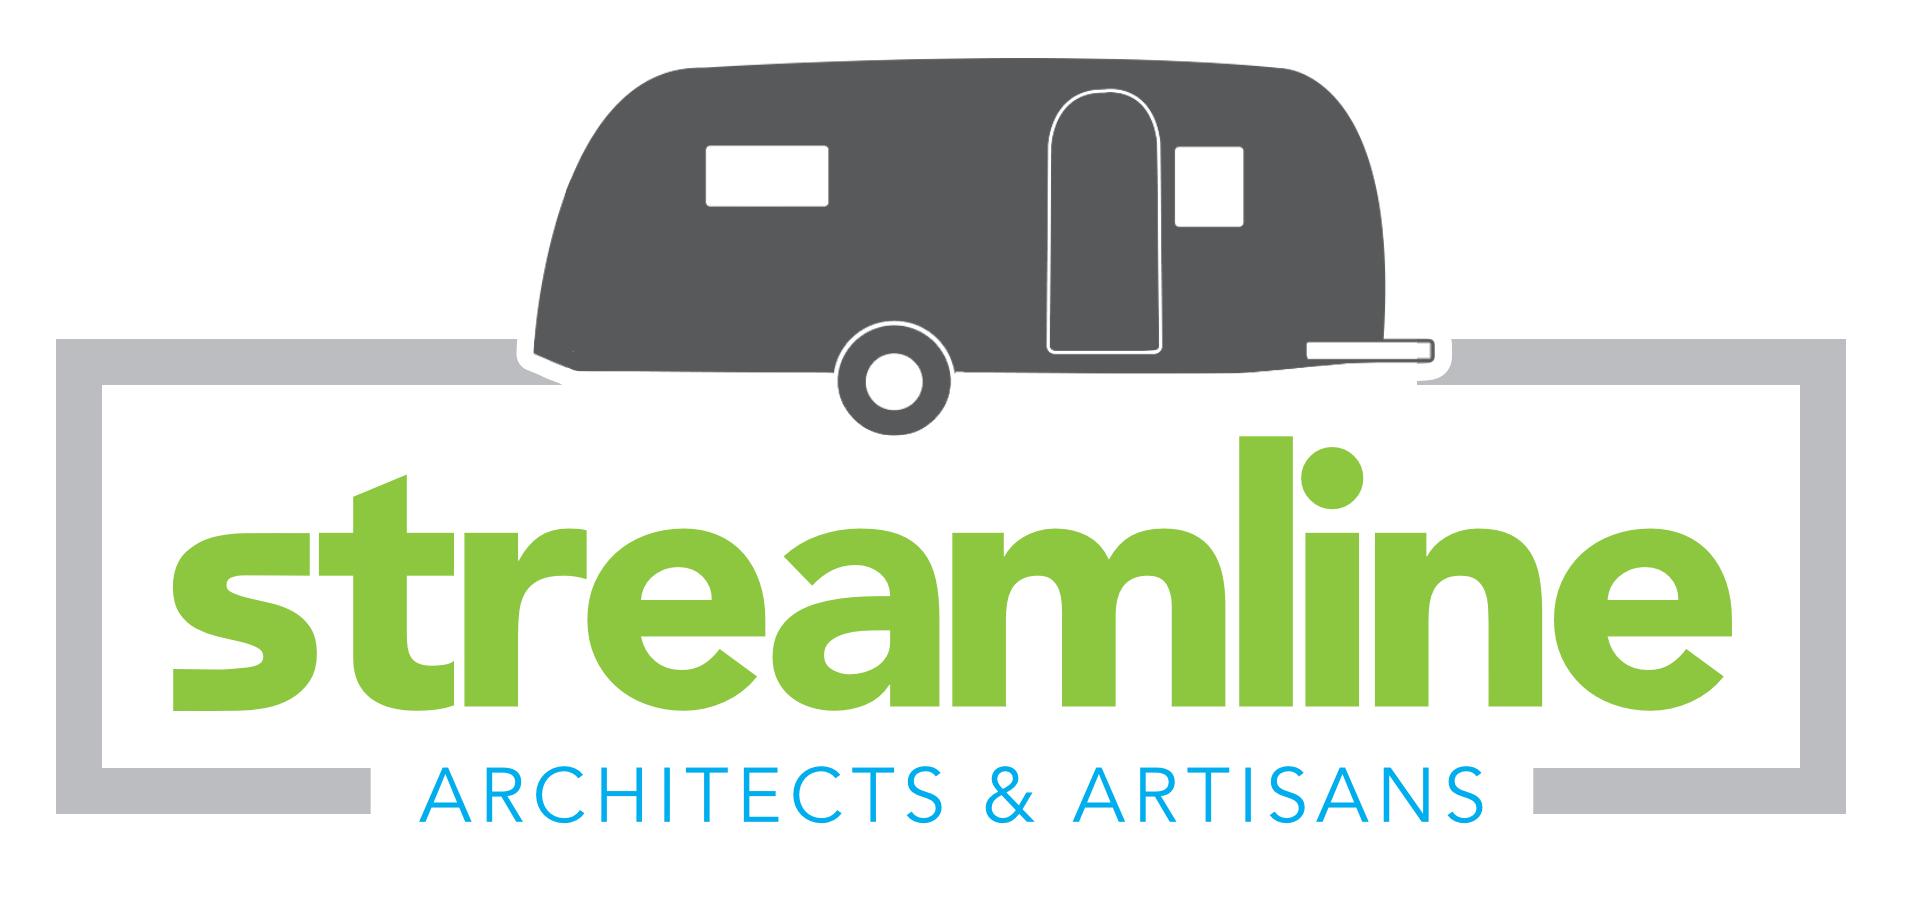 streamline architects & ARTISANS Transpatent.png